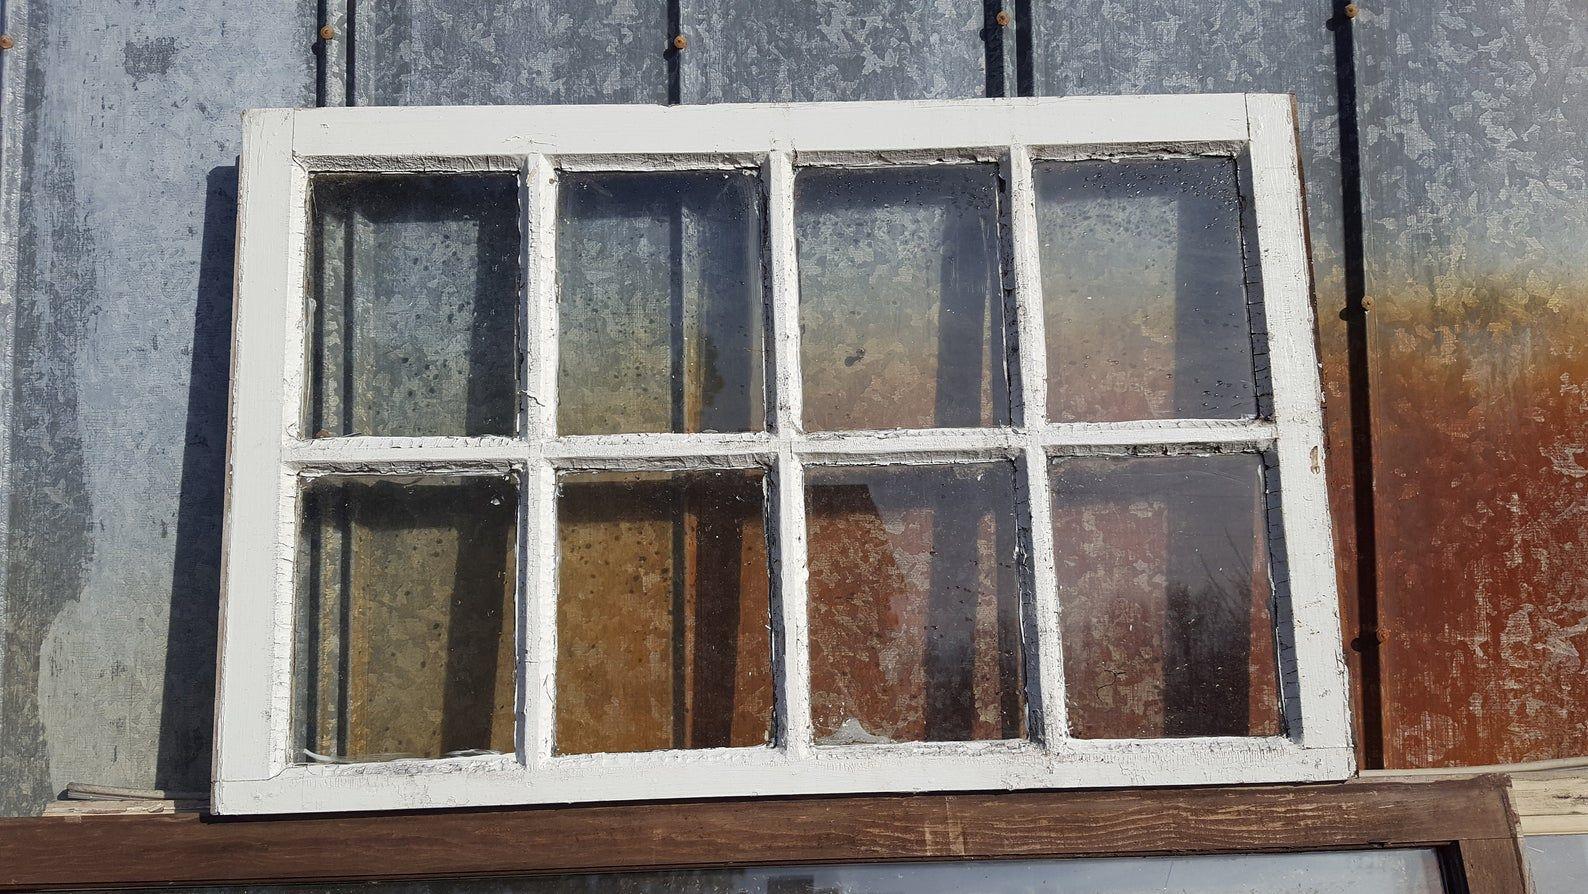 Vintage Authentic Reclaimed Antique Window Pane 8 Pane 36x23 Window Frame Rustic Antique Windows Farm Decor Window Frame